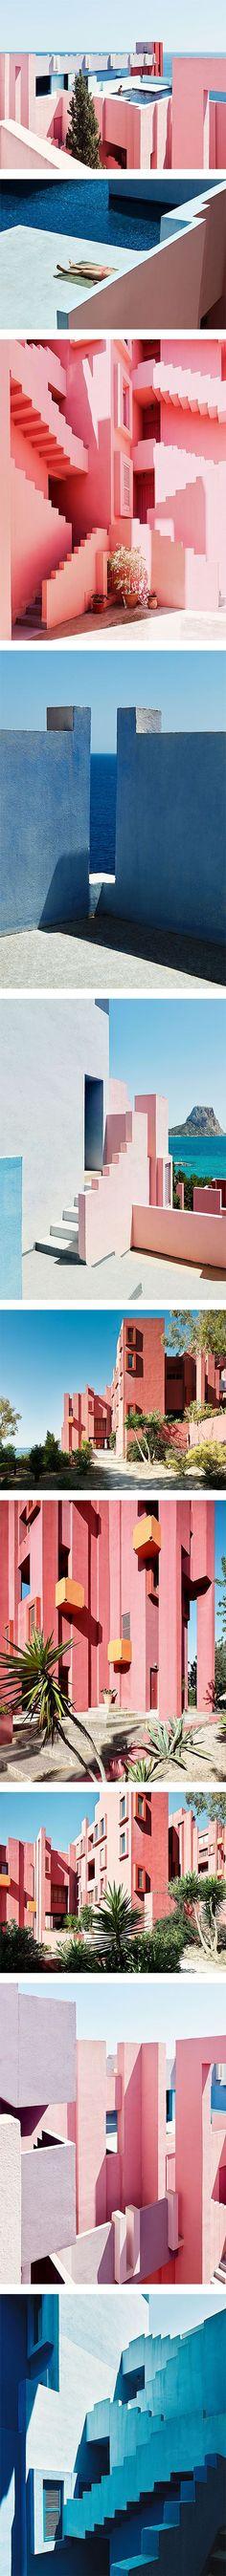 La Muralla Roja by Ricardo Bofill on Nuji.com #murallaroja #ricardobofill…